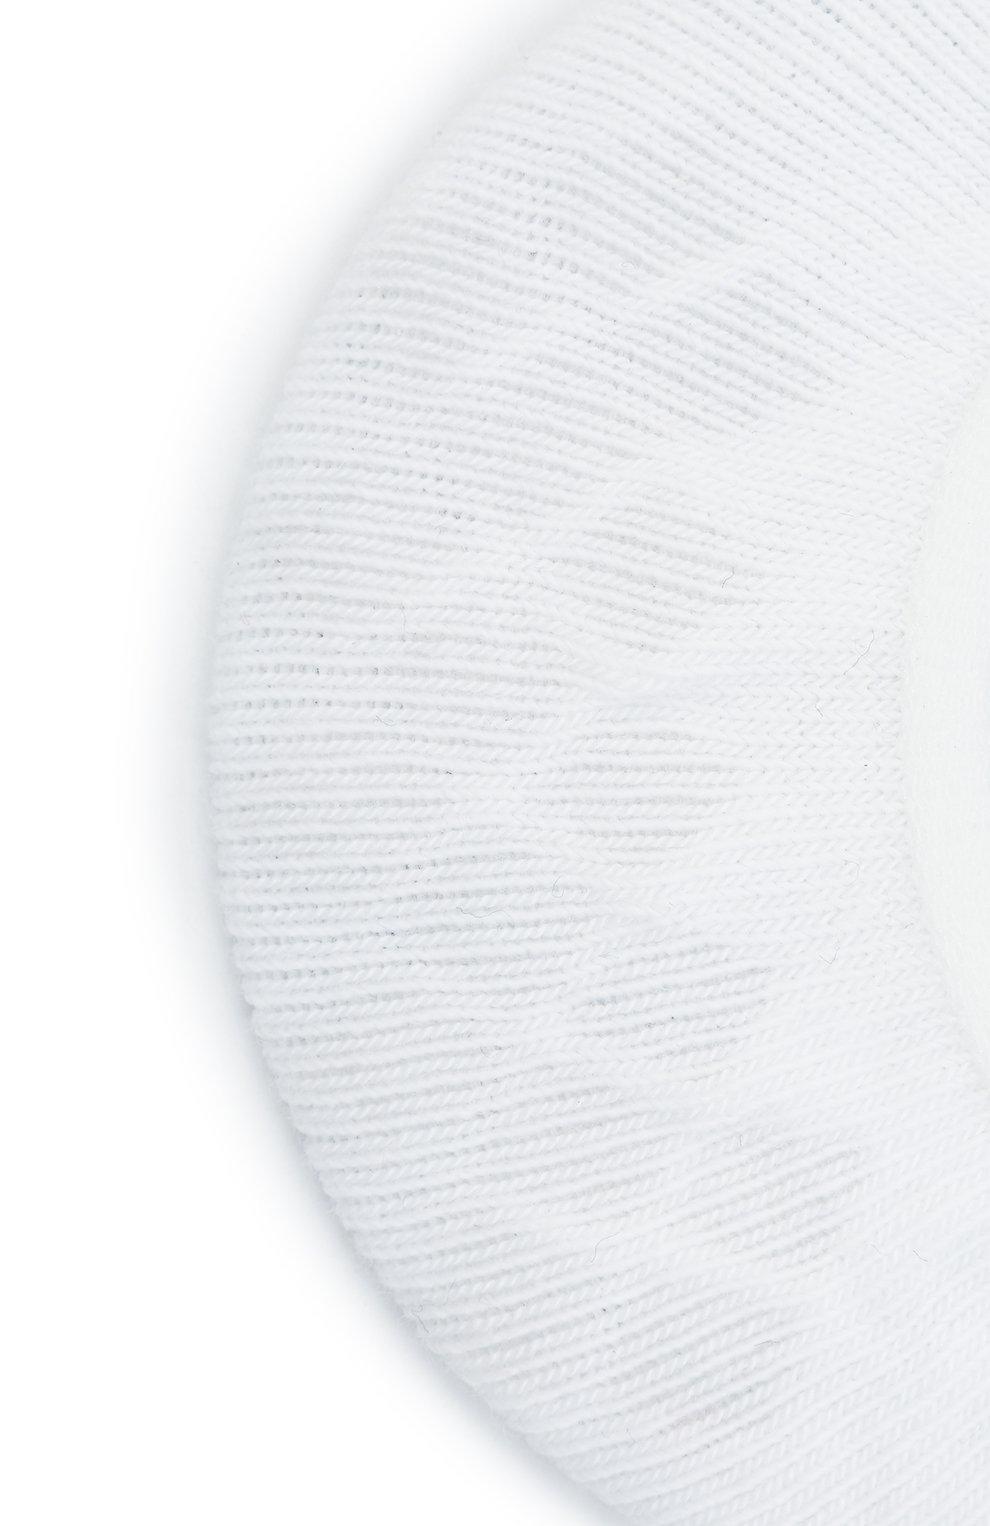 Детские носки FALKE белого цвета, арт. 10694. | Фото 2 (Материал: Текстиль, Хлопок)